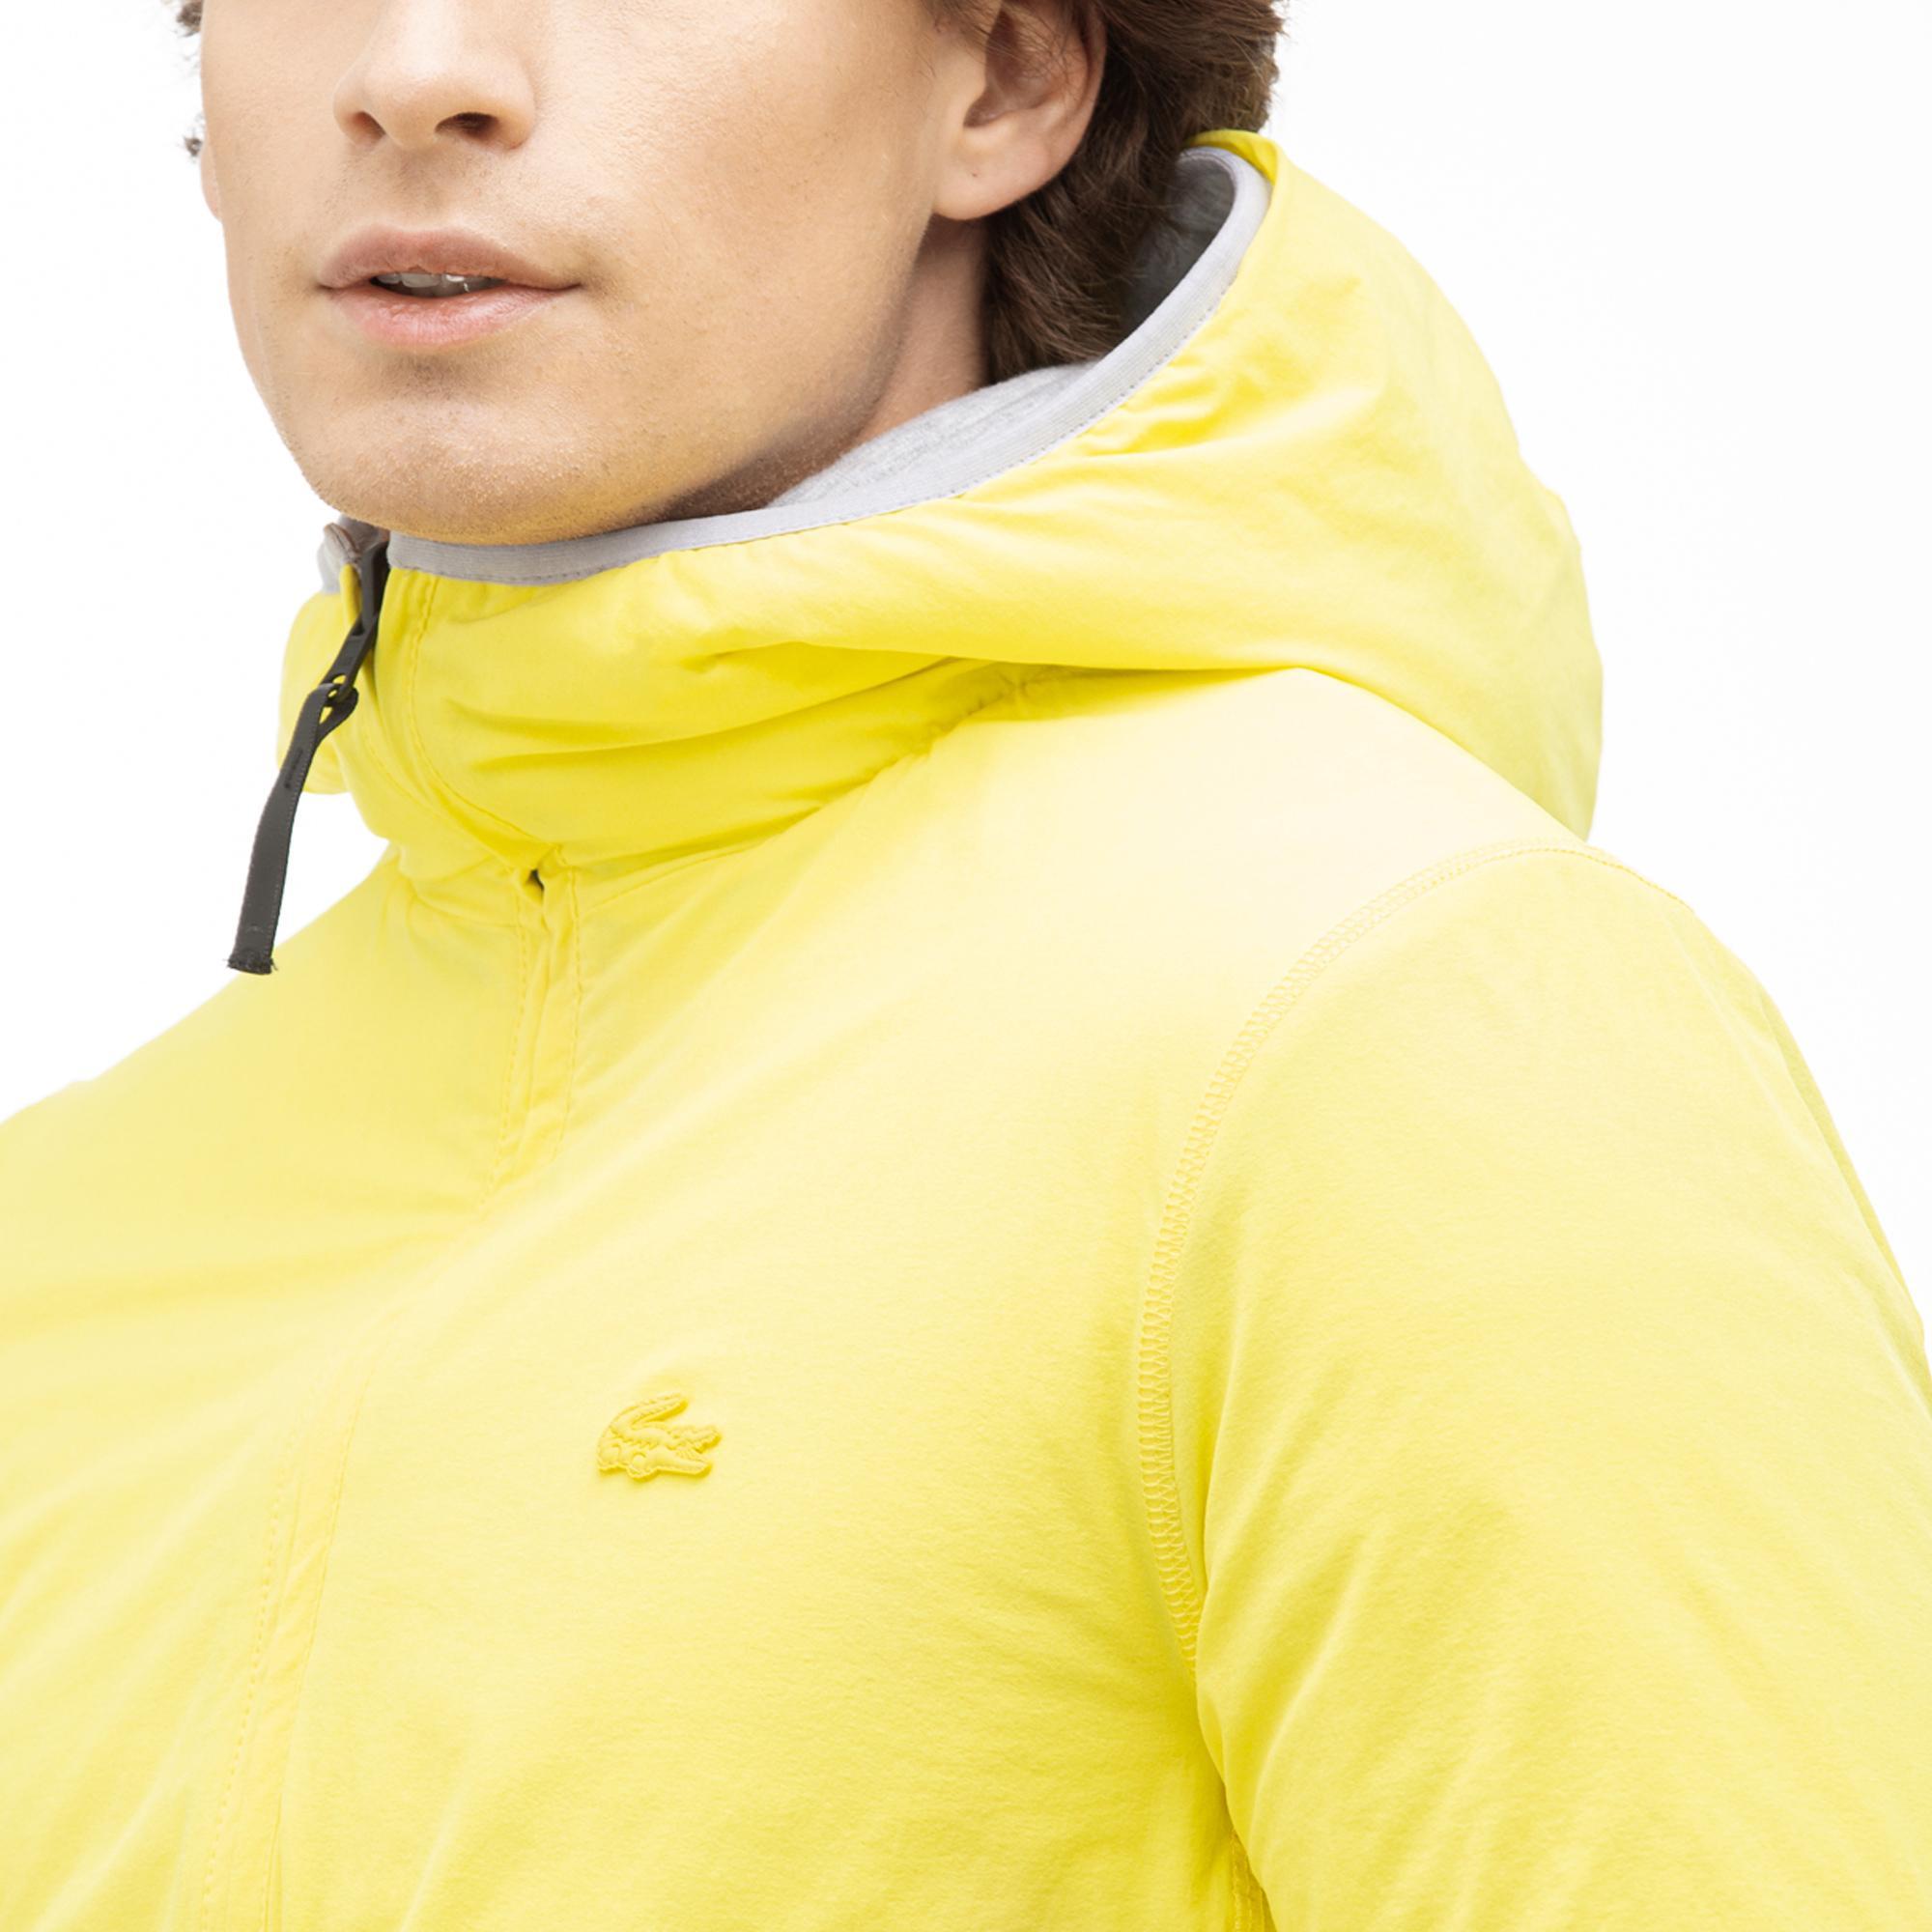 Lacoste Motion Erkek Kapüşonlu Çift Taraflı Mont / Sweatshirt